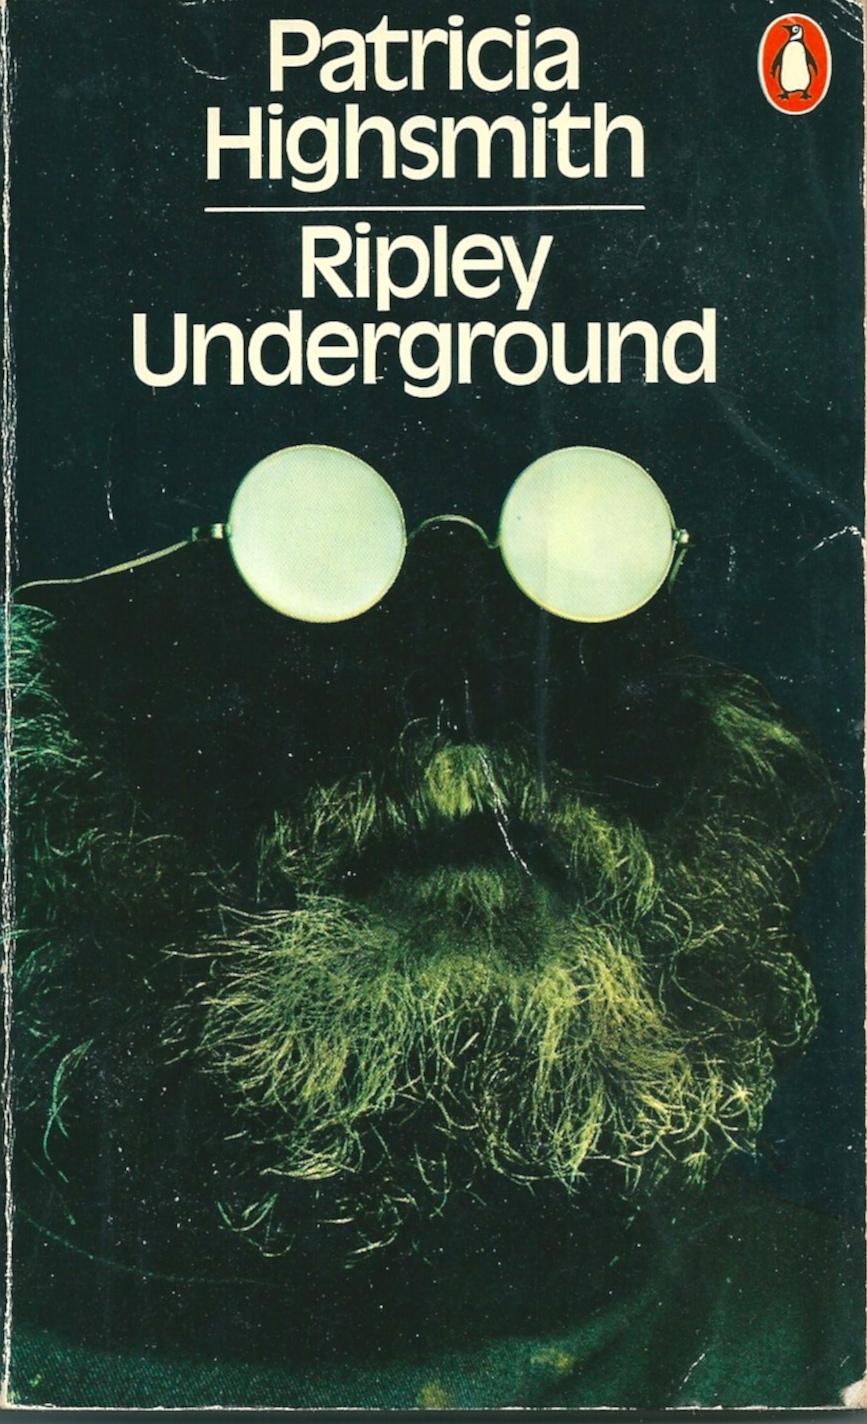 Ripley Underground, Patricia Highsmith, 1973 Penguin edn.